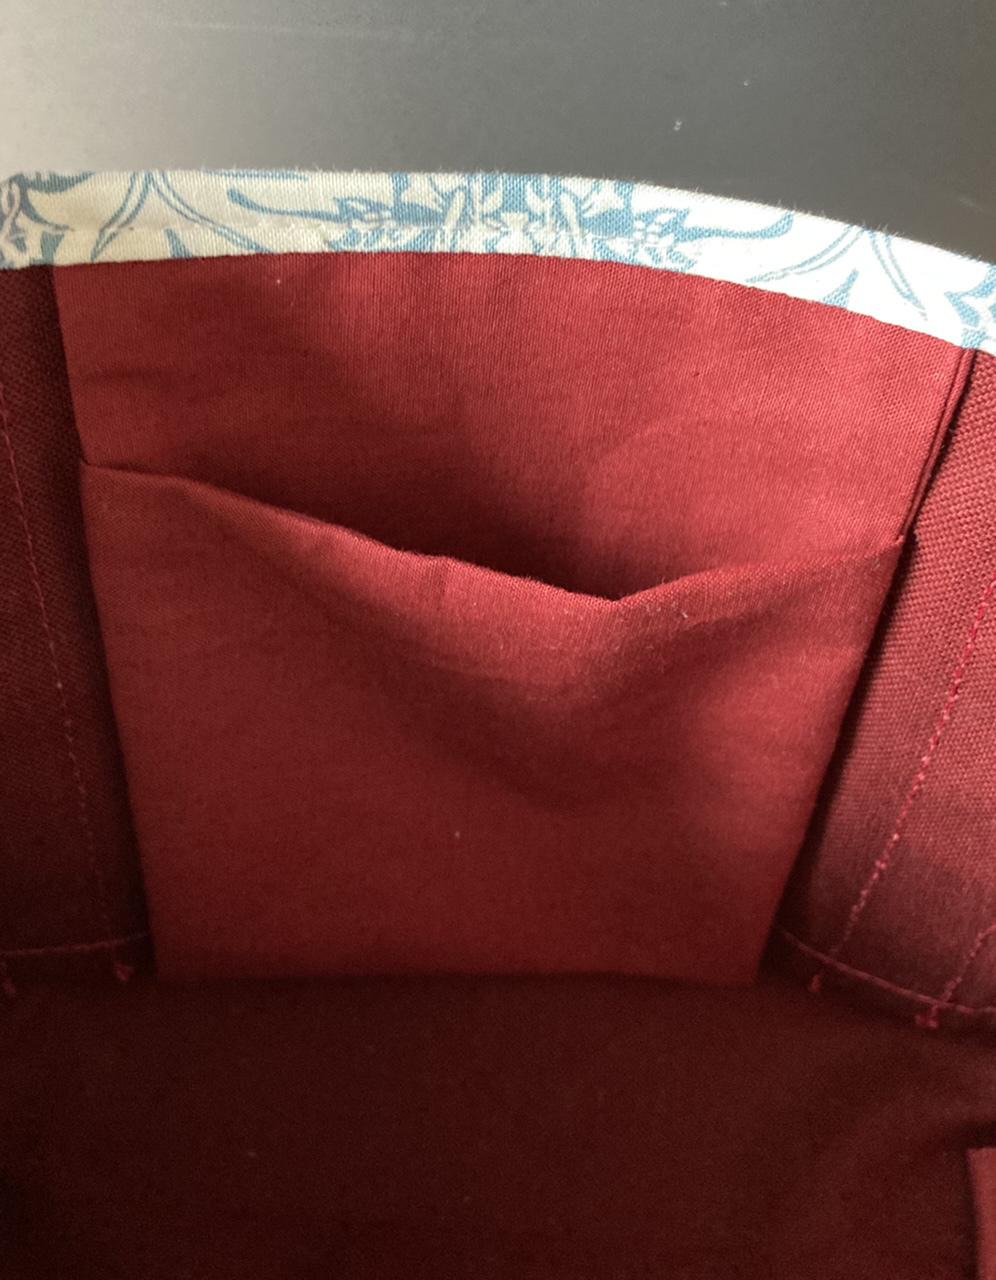 SSサイズ 8号帆布トートバッグ 予約販売開始します_c0131818_22291637.jpeg